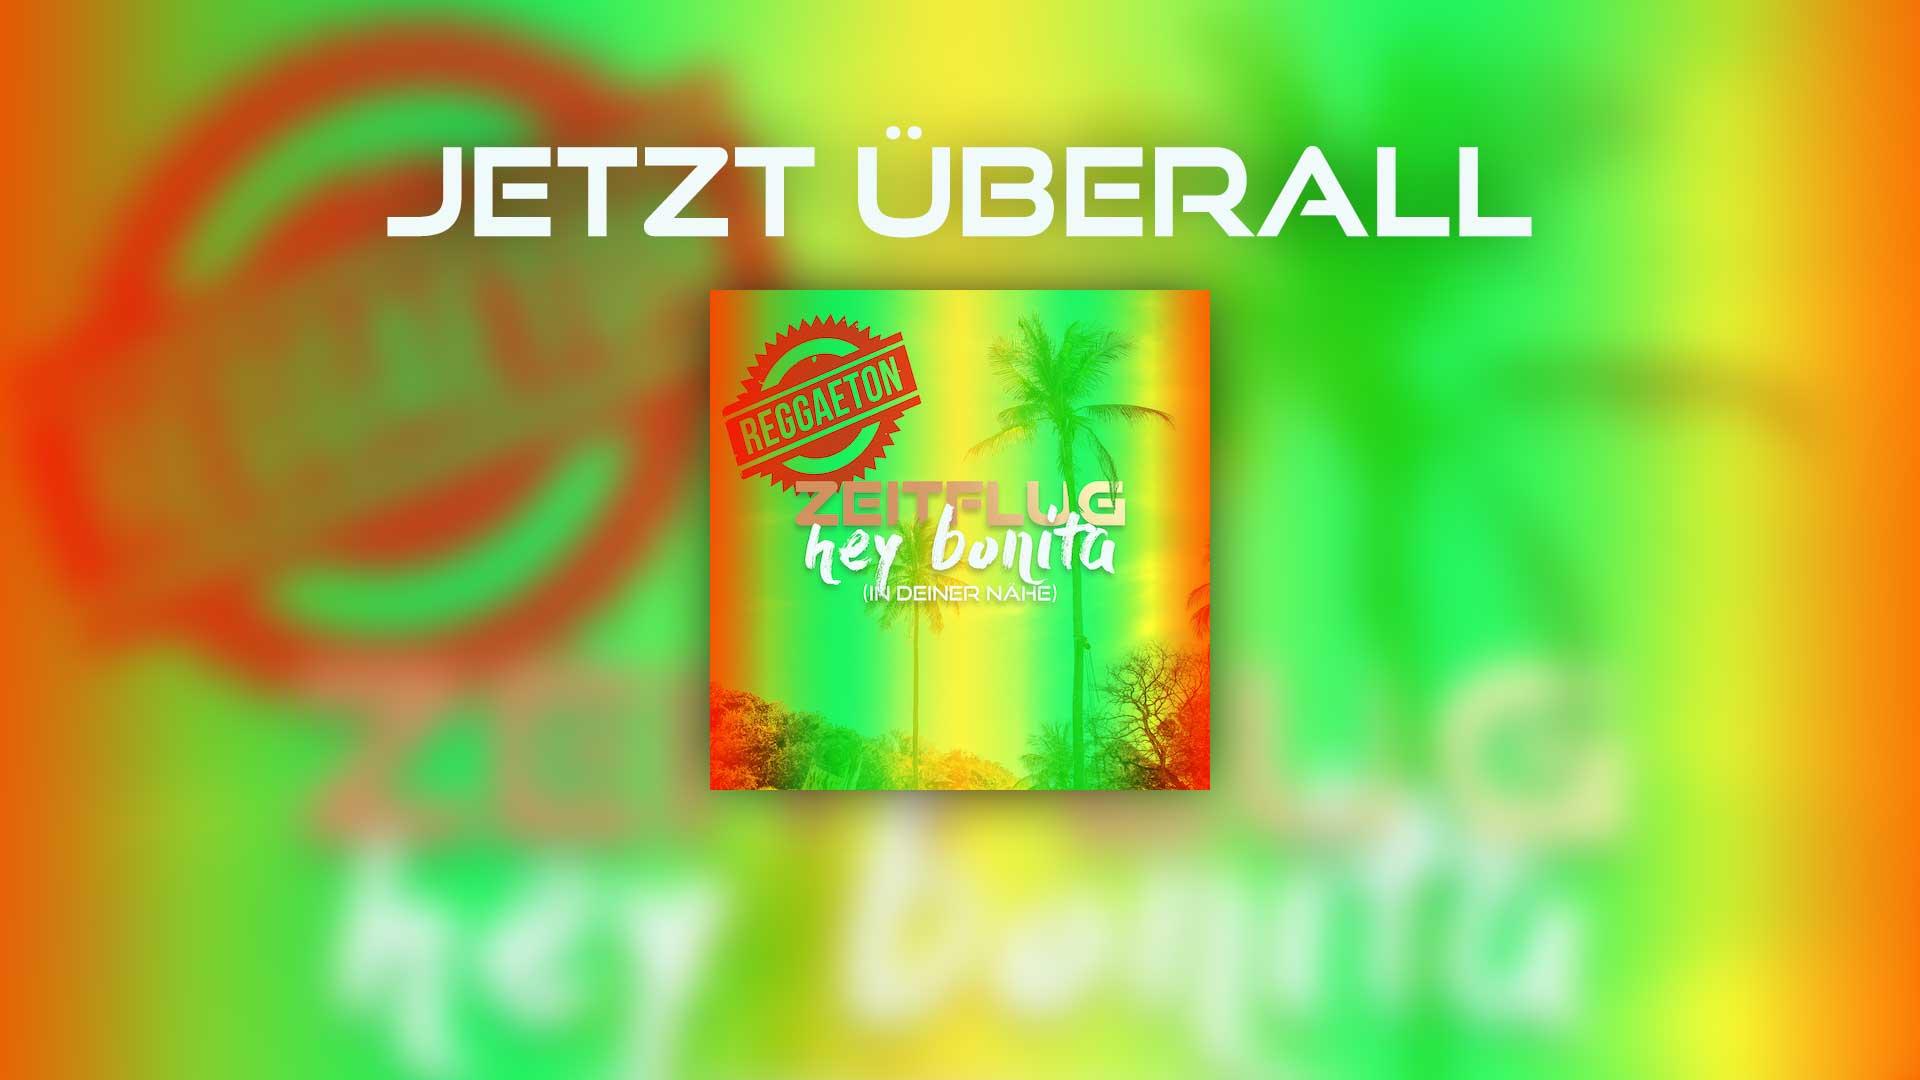 Zeitflug – Hey Bonita (In Deiner Nähe) – Reggaeton RMX